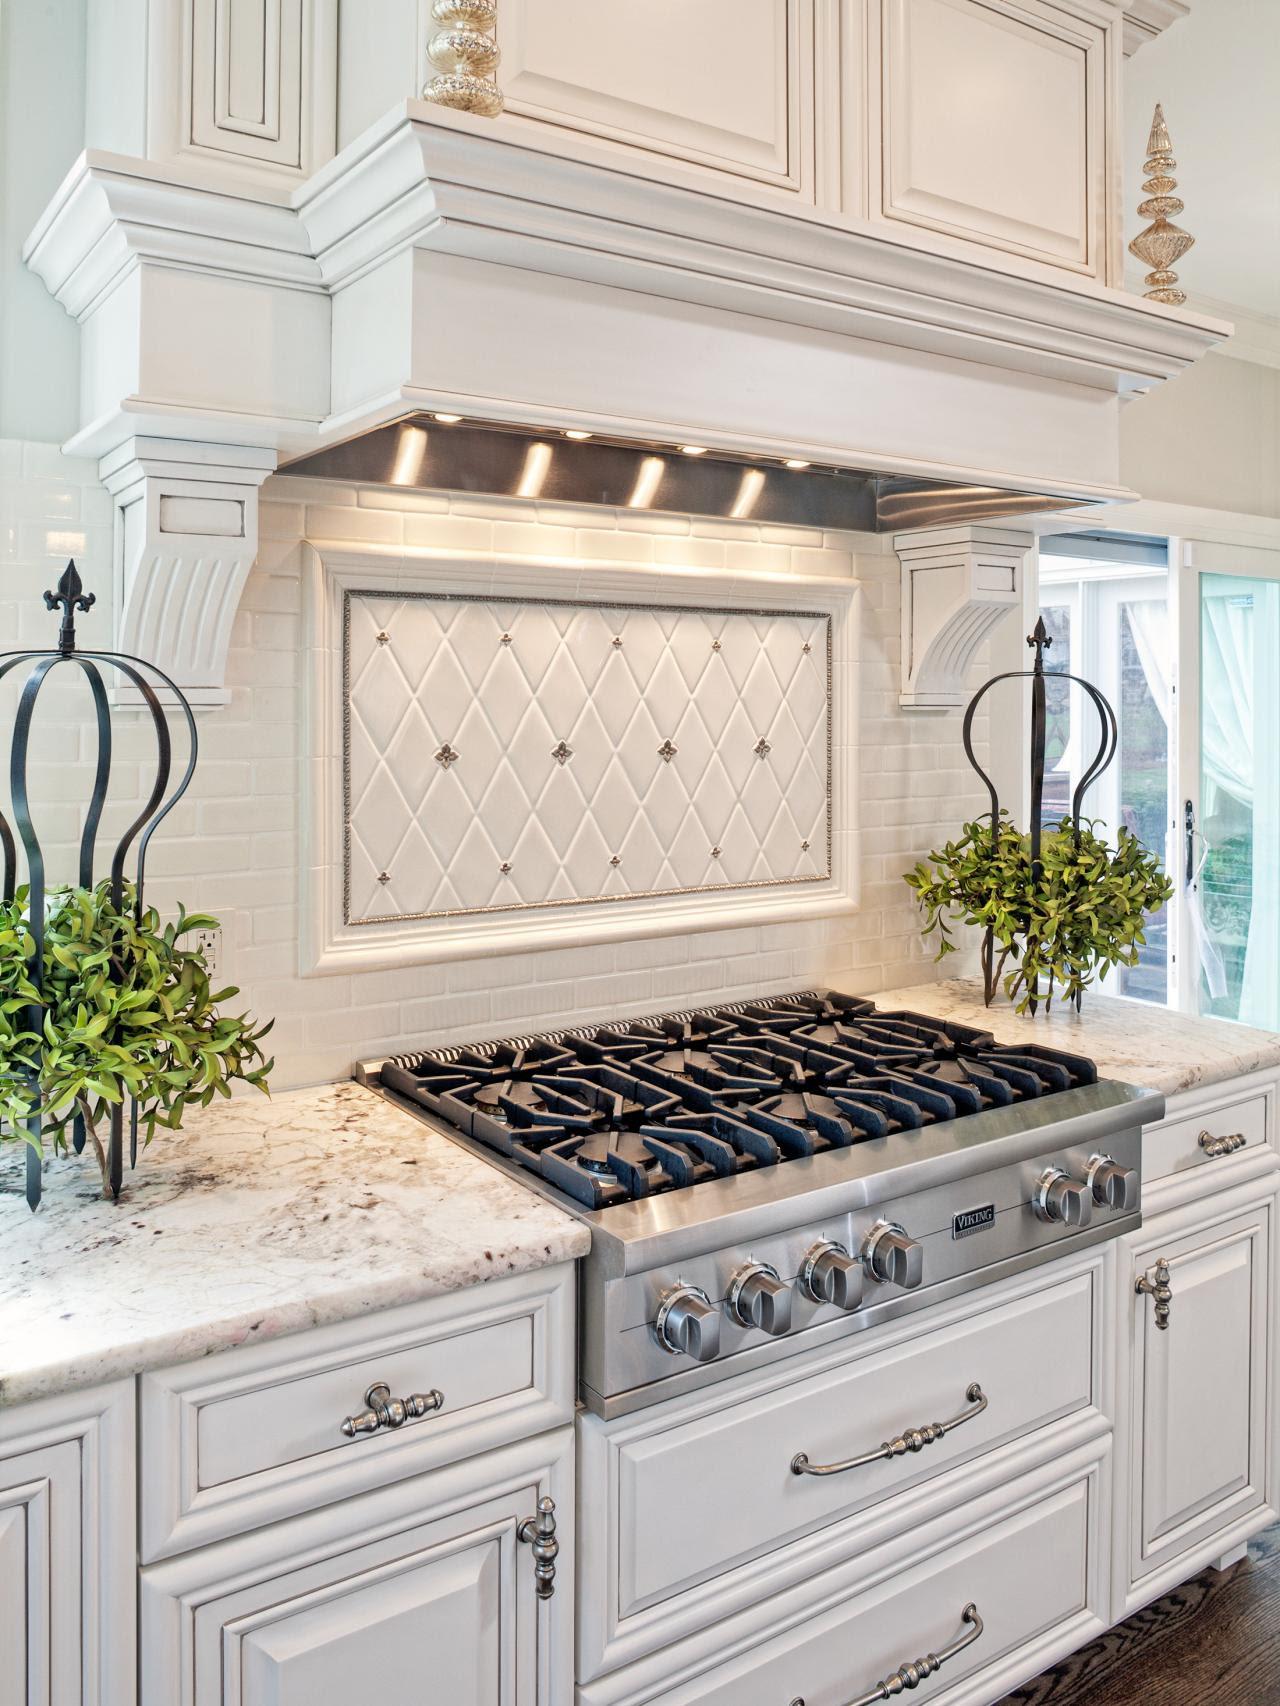 - Best Kitchen Backsplash Ideas - Tile Designs For Kitchen